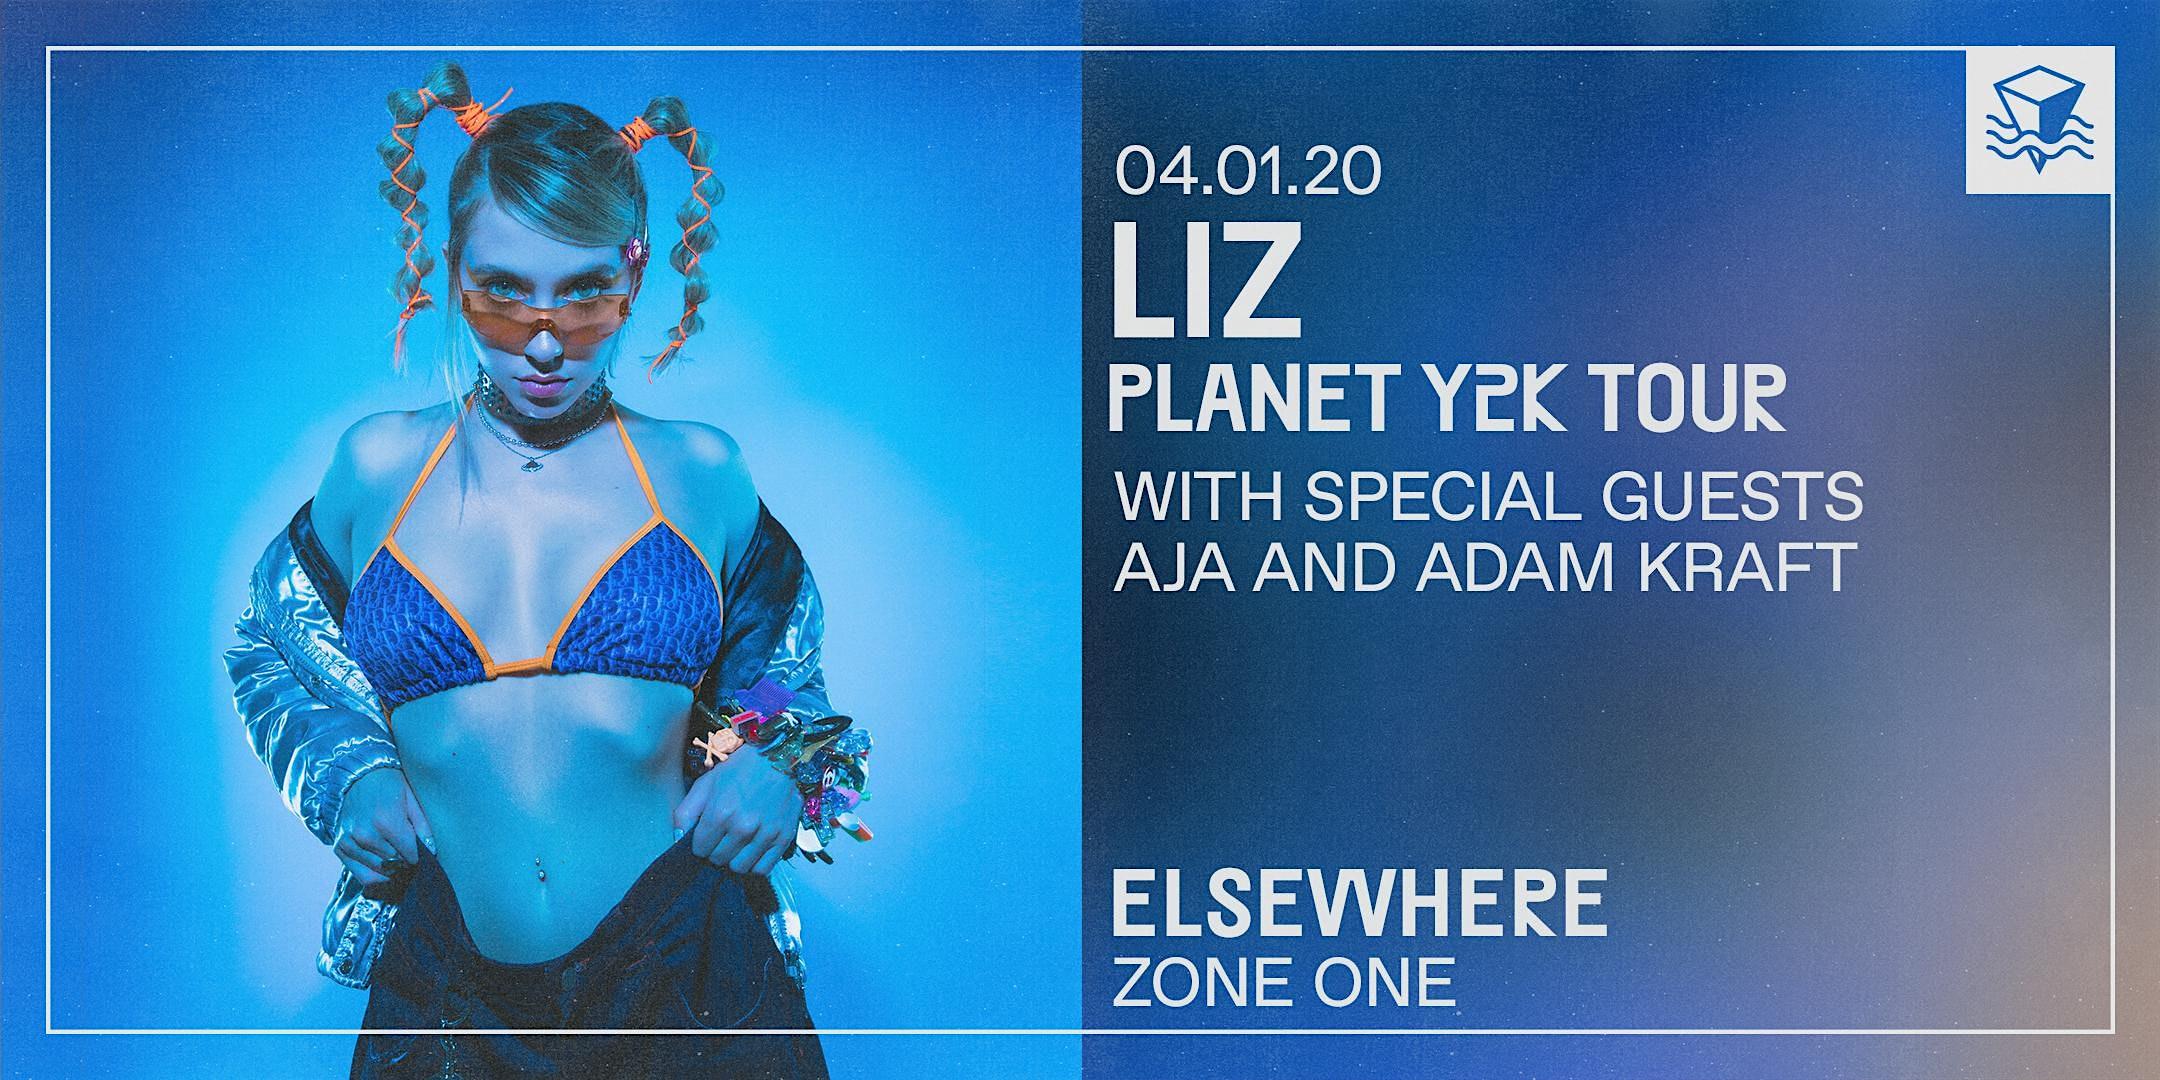 LIZ Planet Y2K Tour